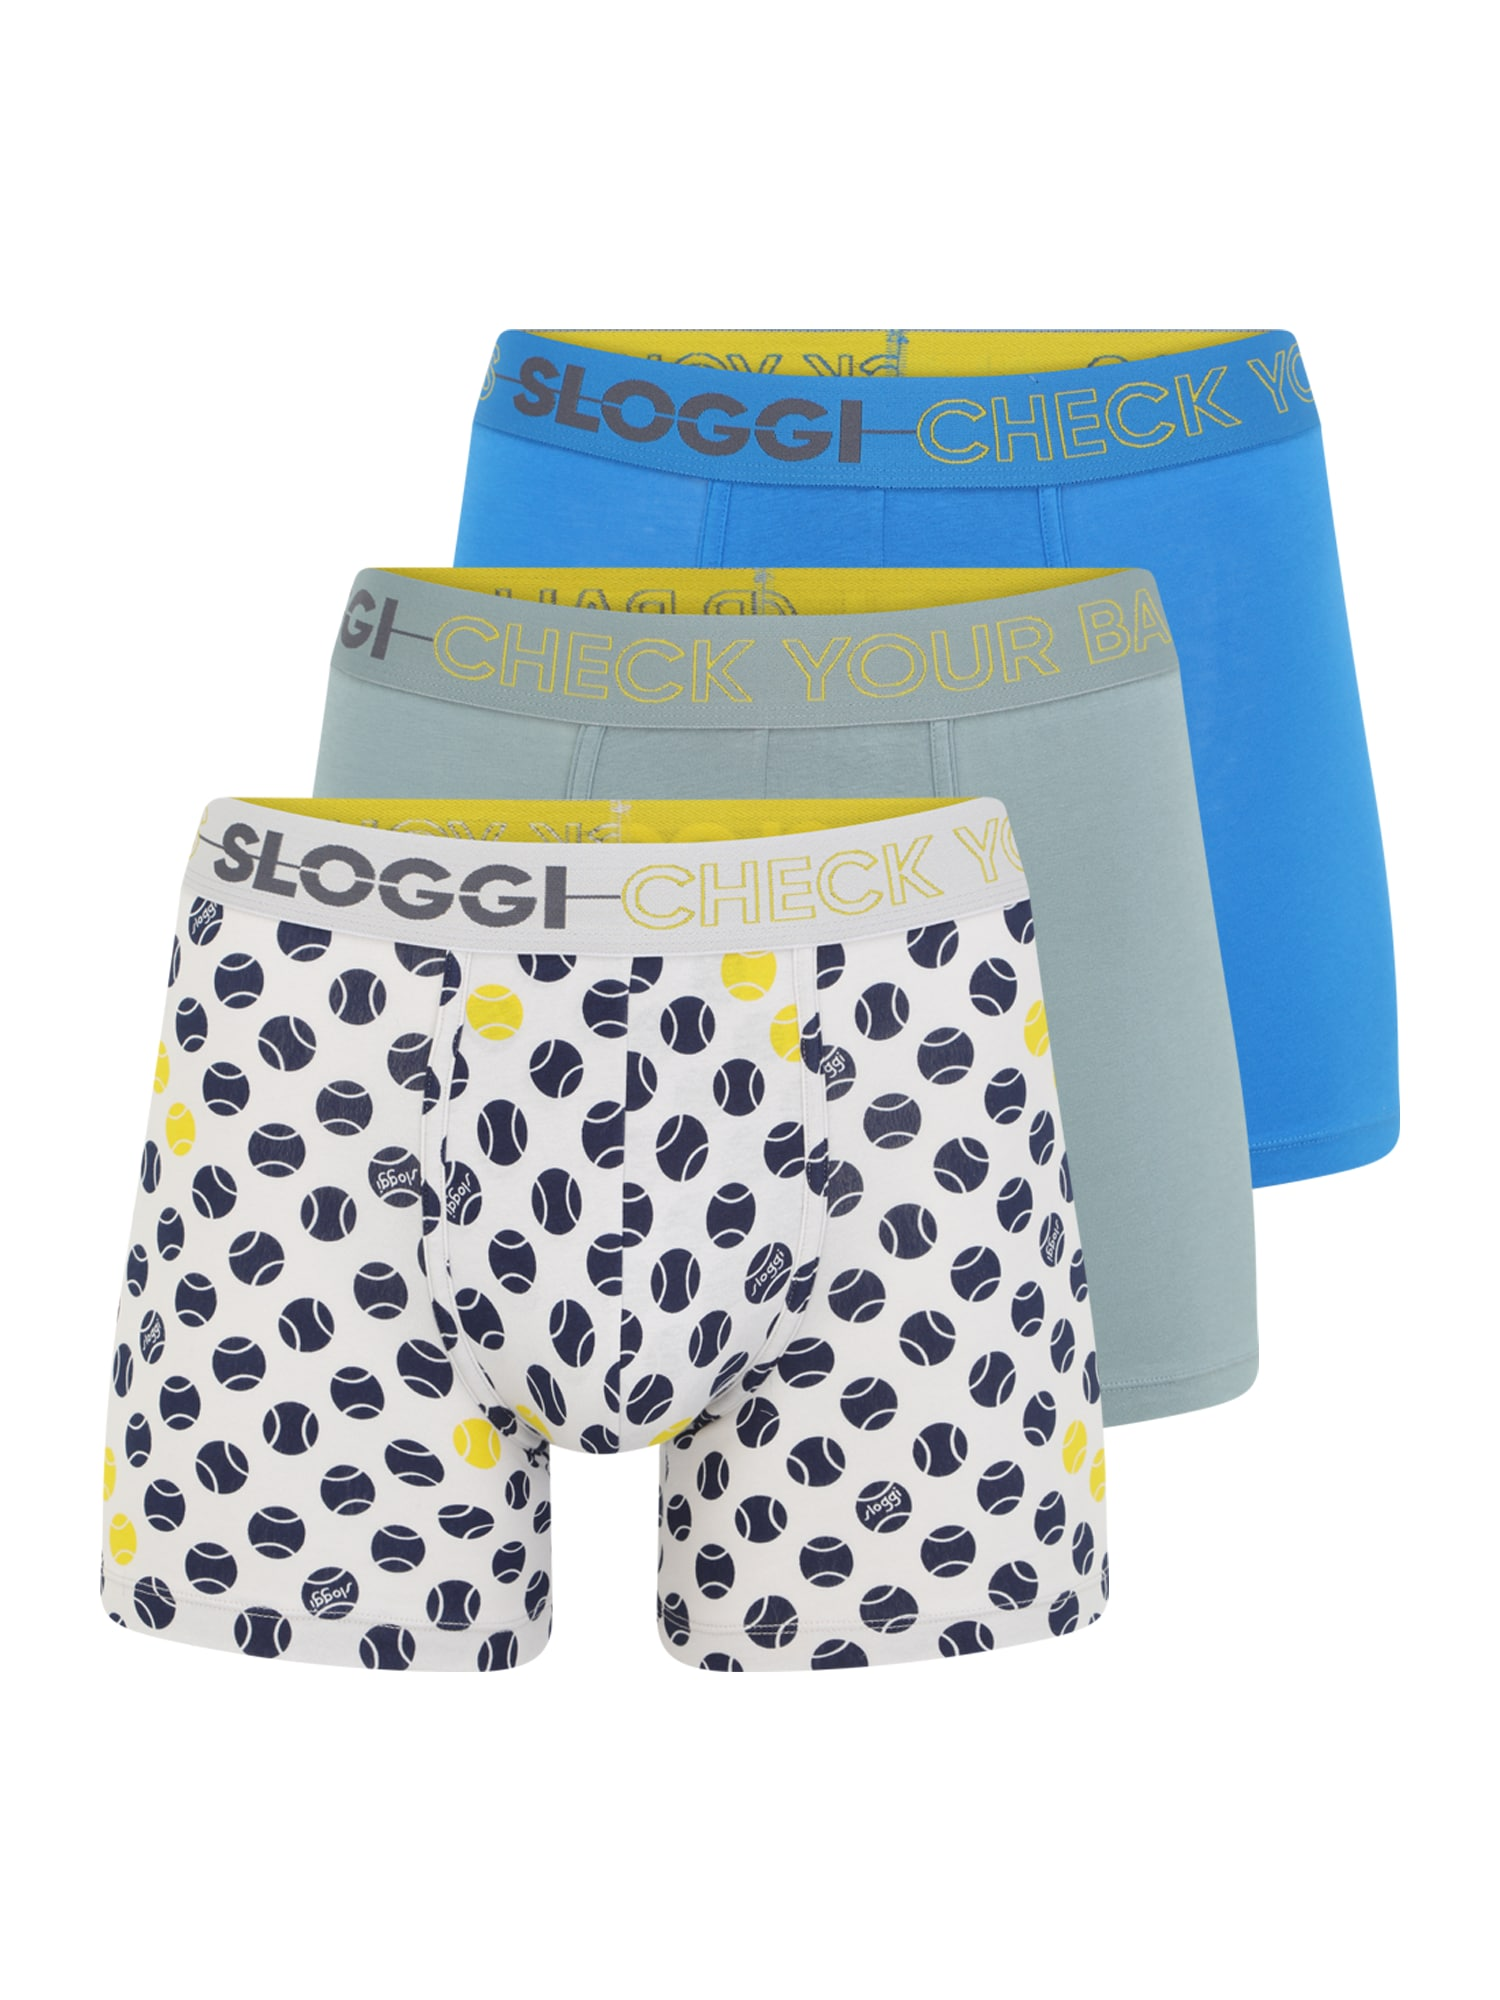 SLOGGI Boxer trumpikės mėlyna / tamsiai mėlyna / balta / žalia / geltona